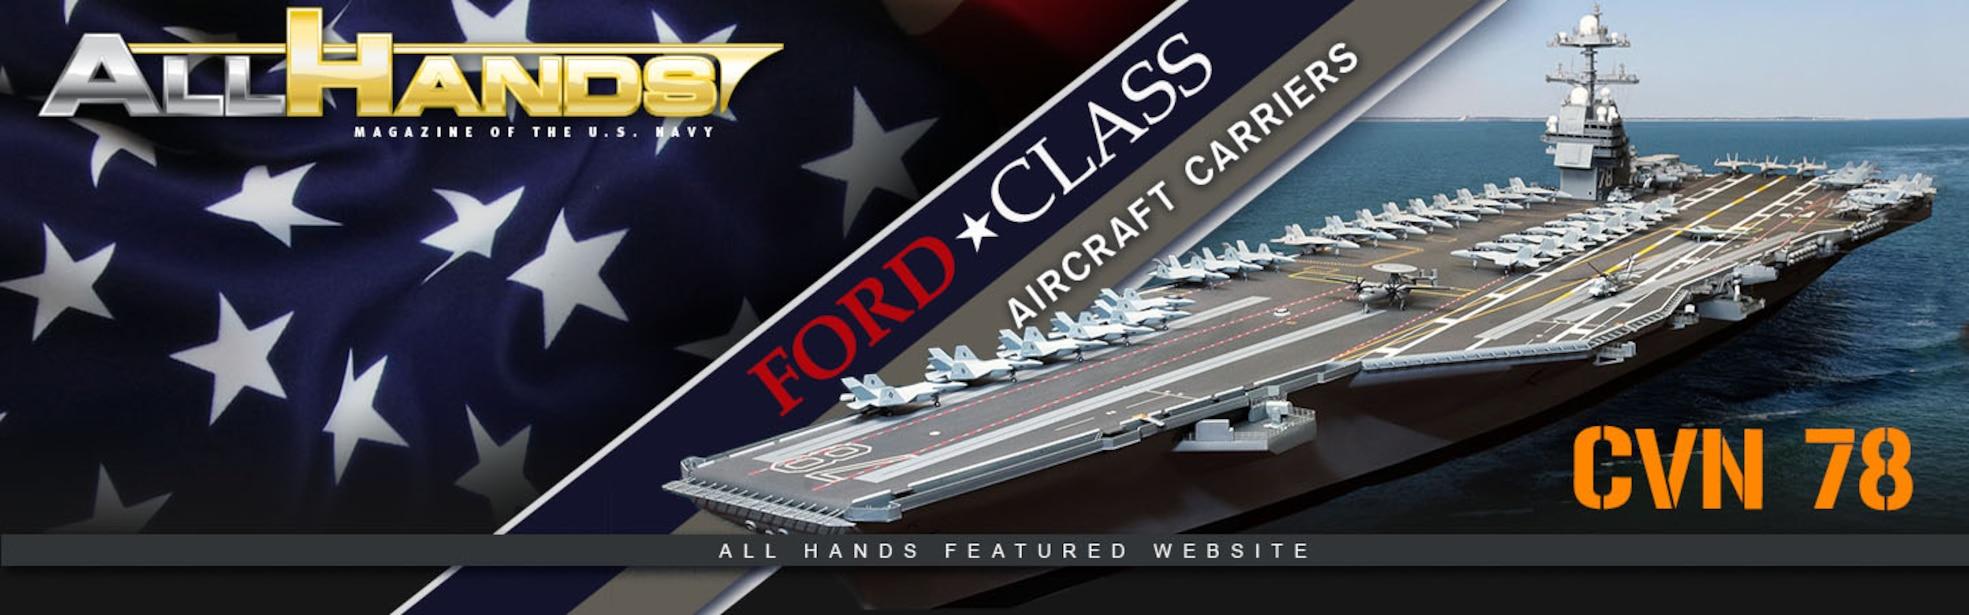 Gerald R. Ford (CVN 78) Banner